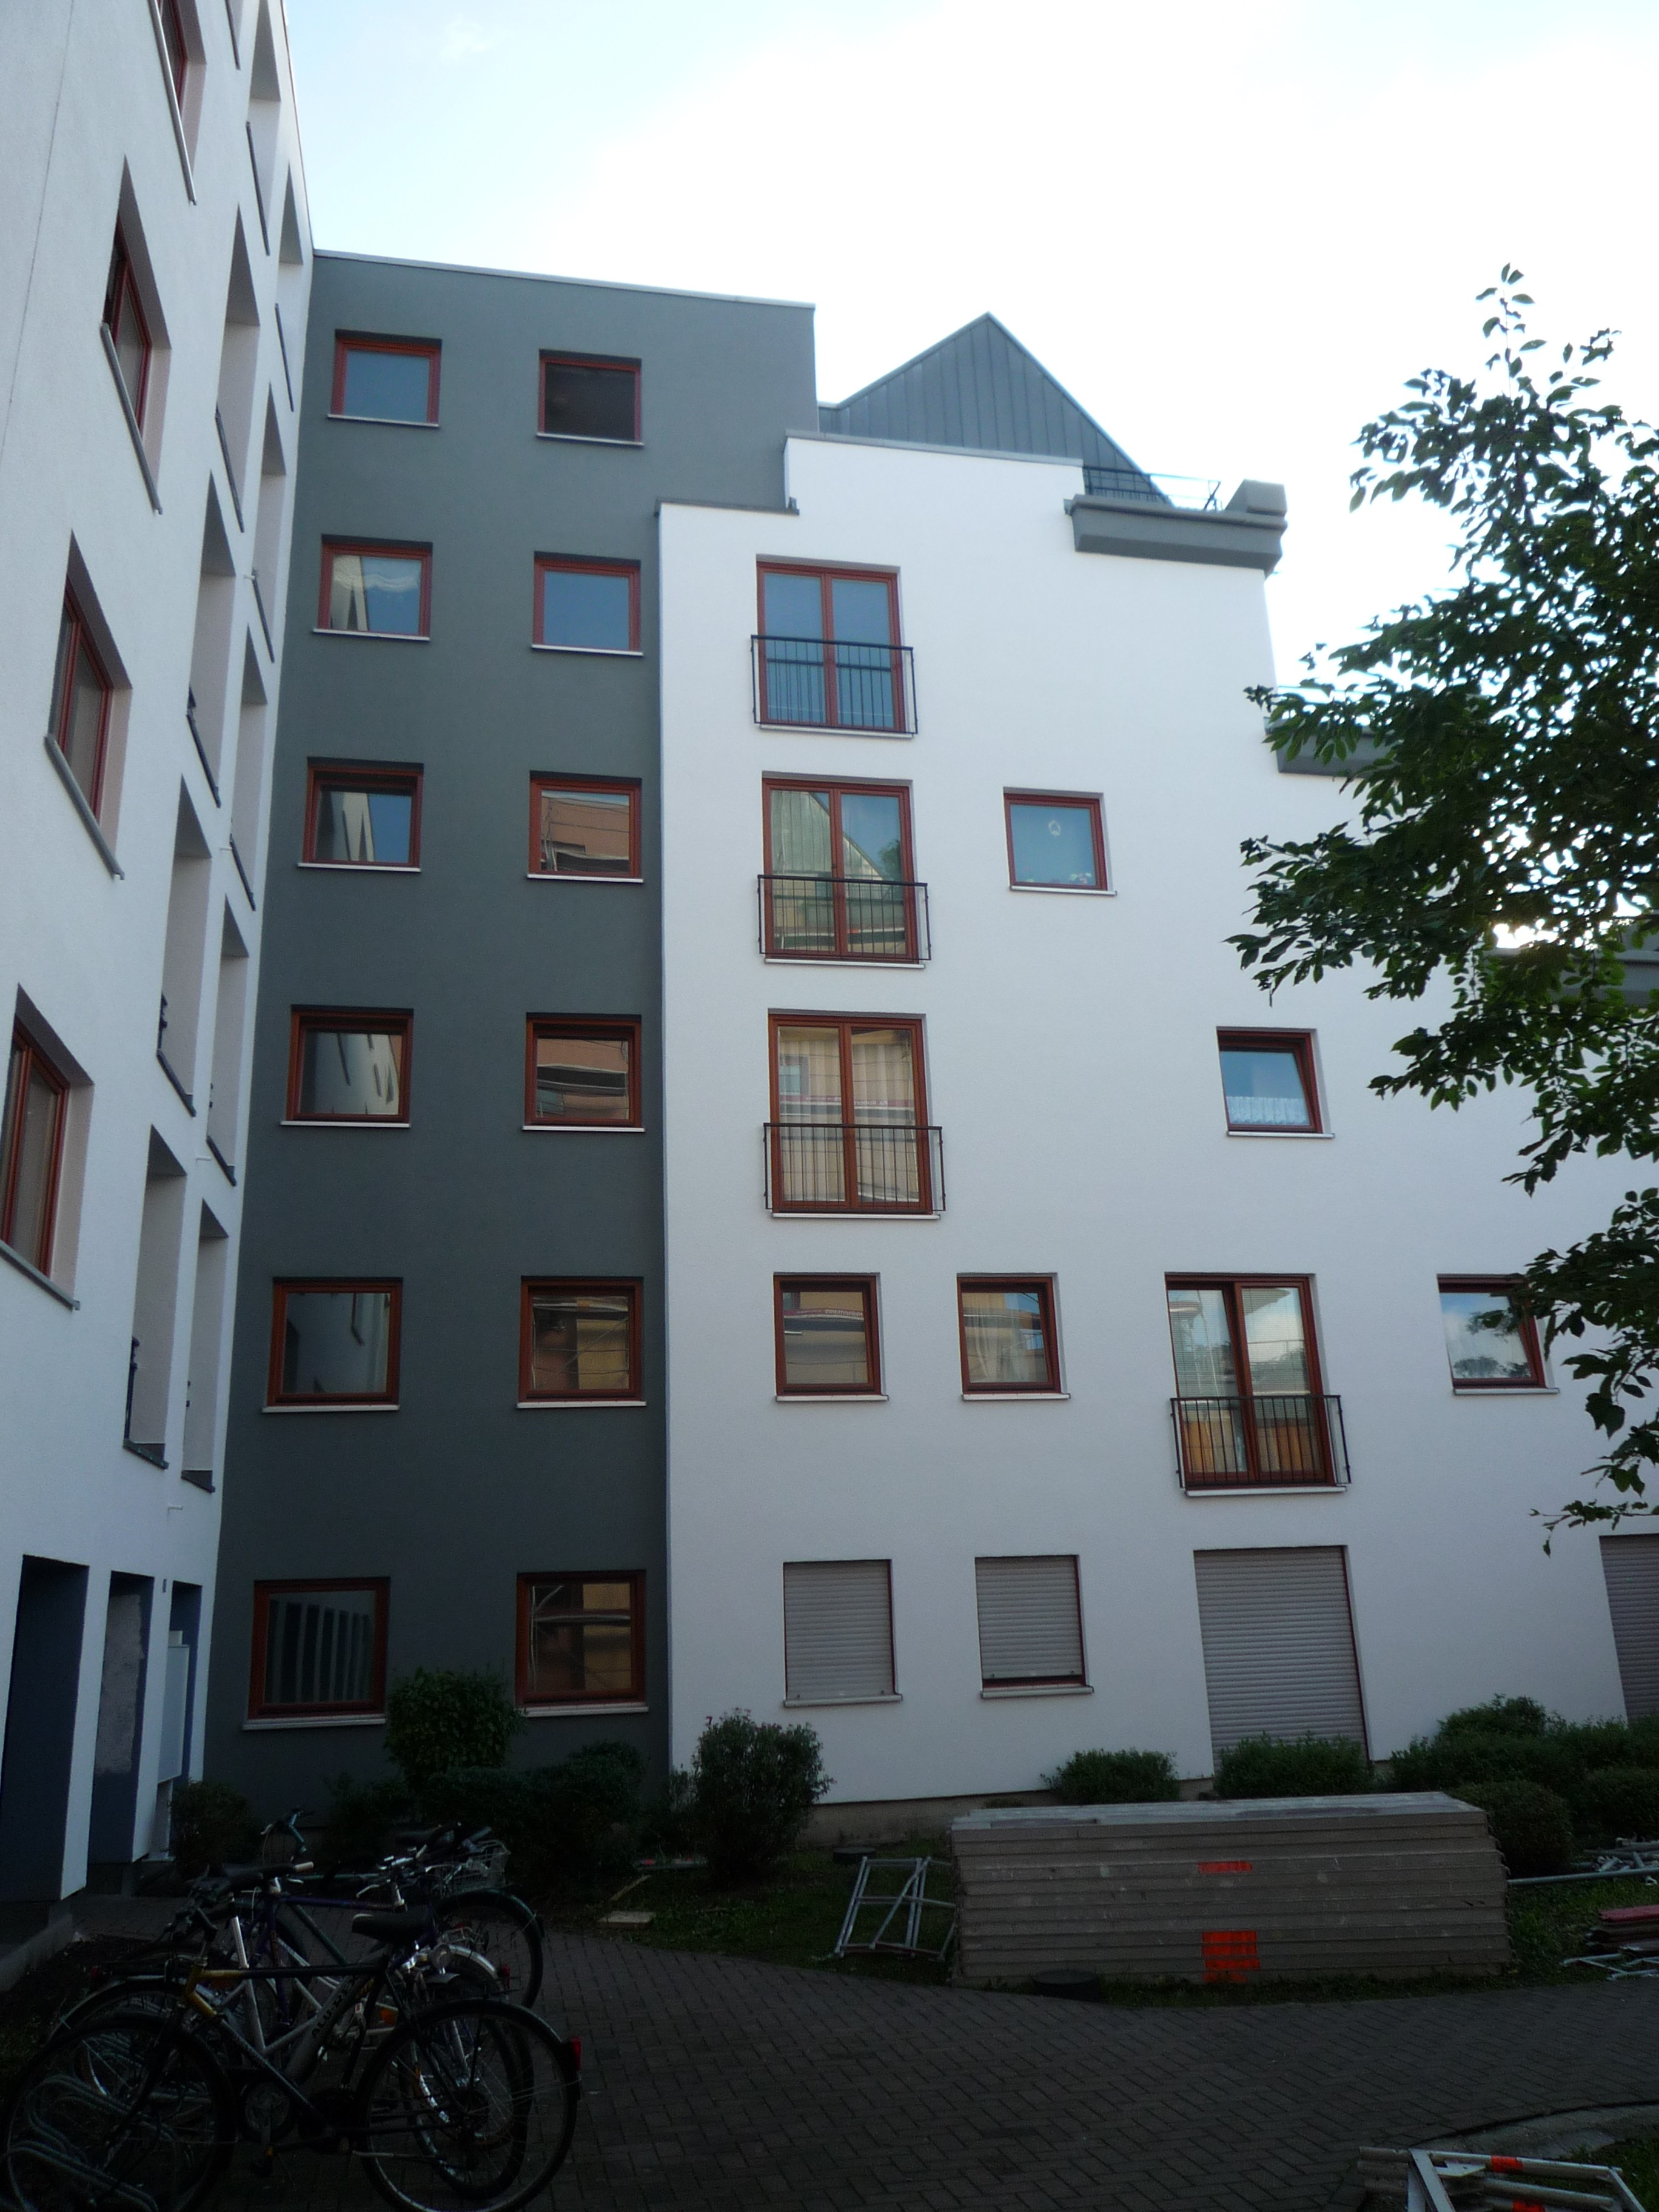 Architekten In Kiel architekturbüro kiel kersig hanneken kirchen stange architekten architekturb ro kiel und